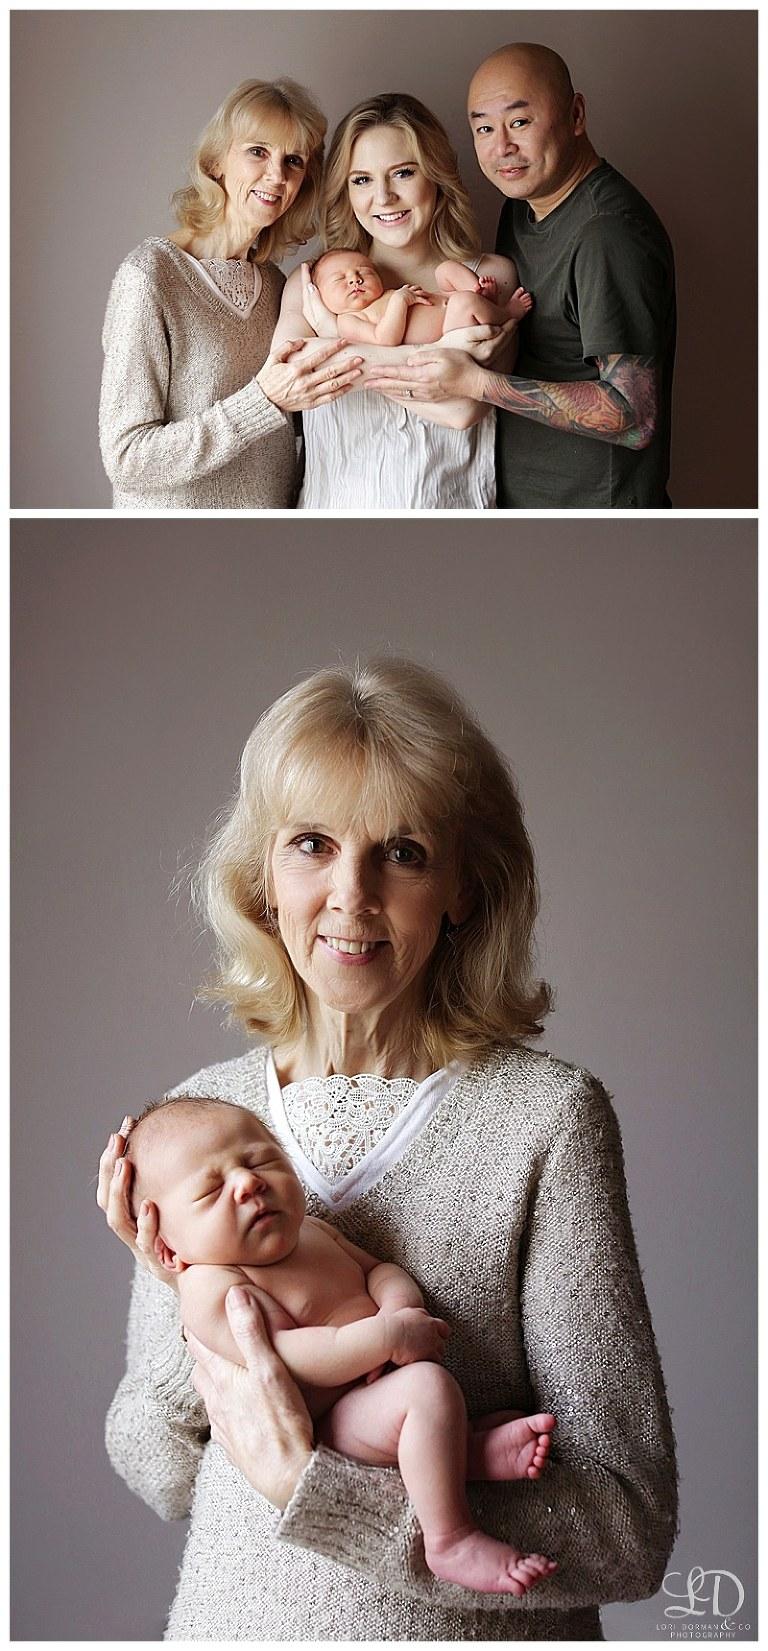 sweet maternity photoshoot-lori dorman photography-maternity boudoir-professional photographer_4850.jpg